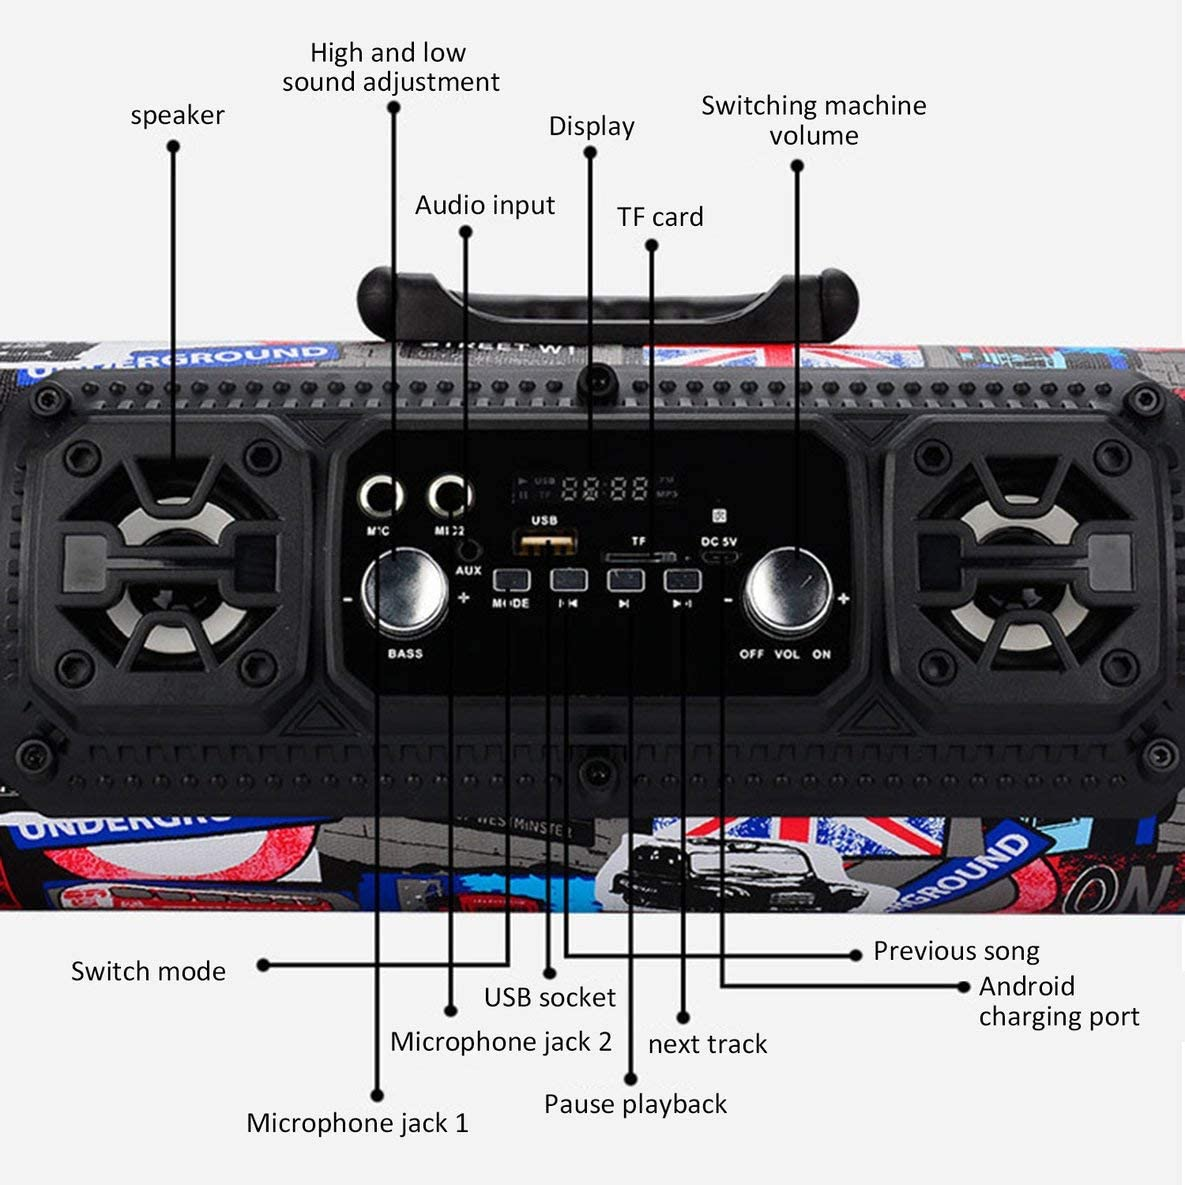 Noradtjcca Outdoor Portable Mobile Powerful Wireless HiFi Stereo BT Speaker Soundbox for PC Phone Music Equipment